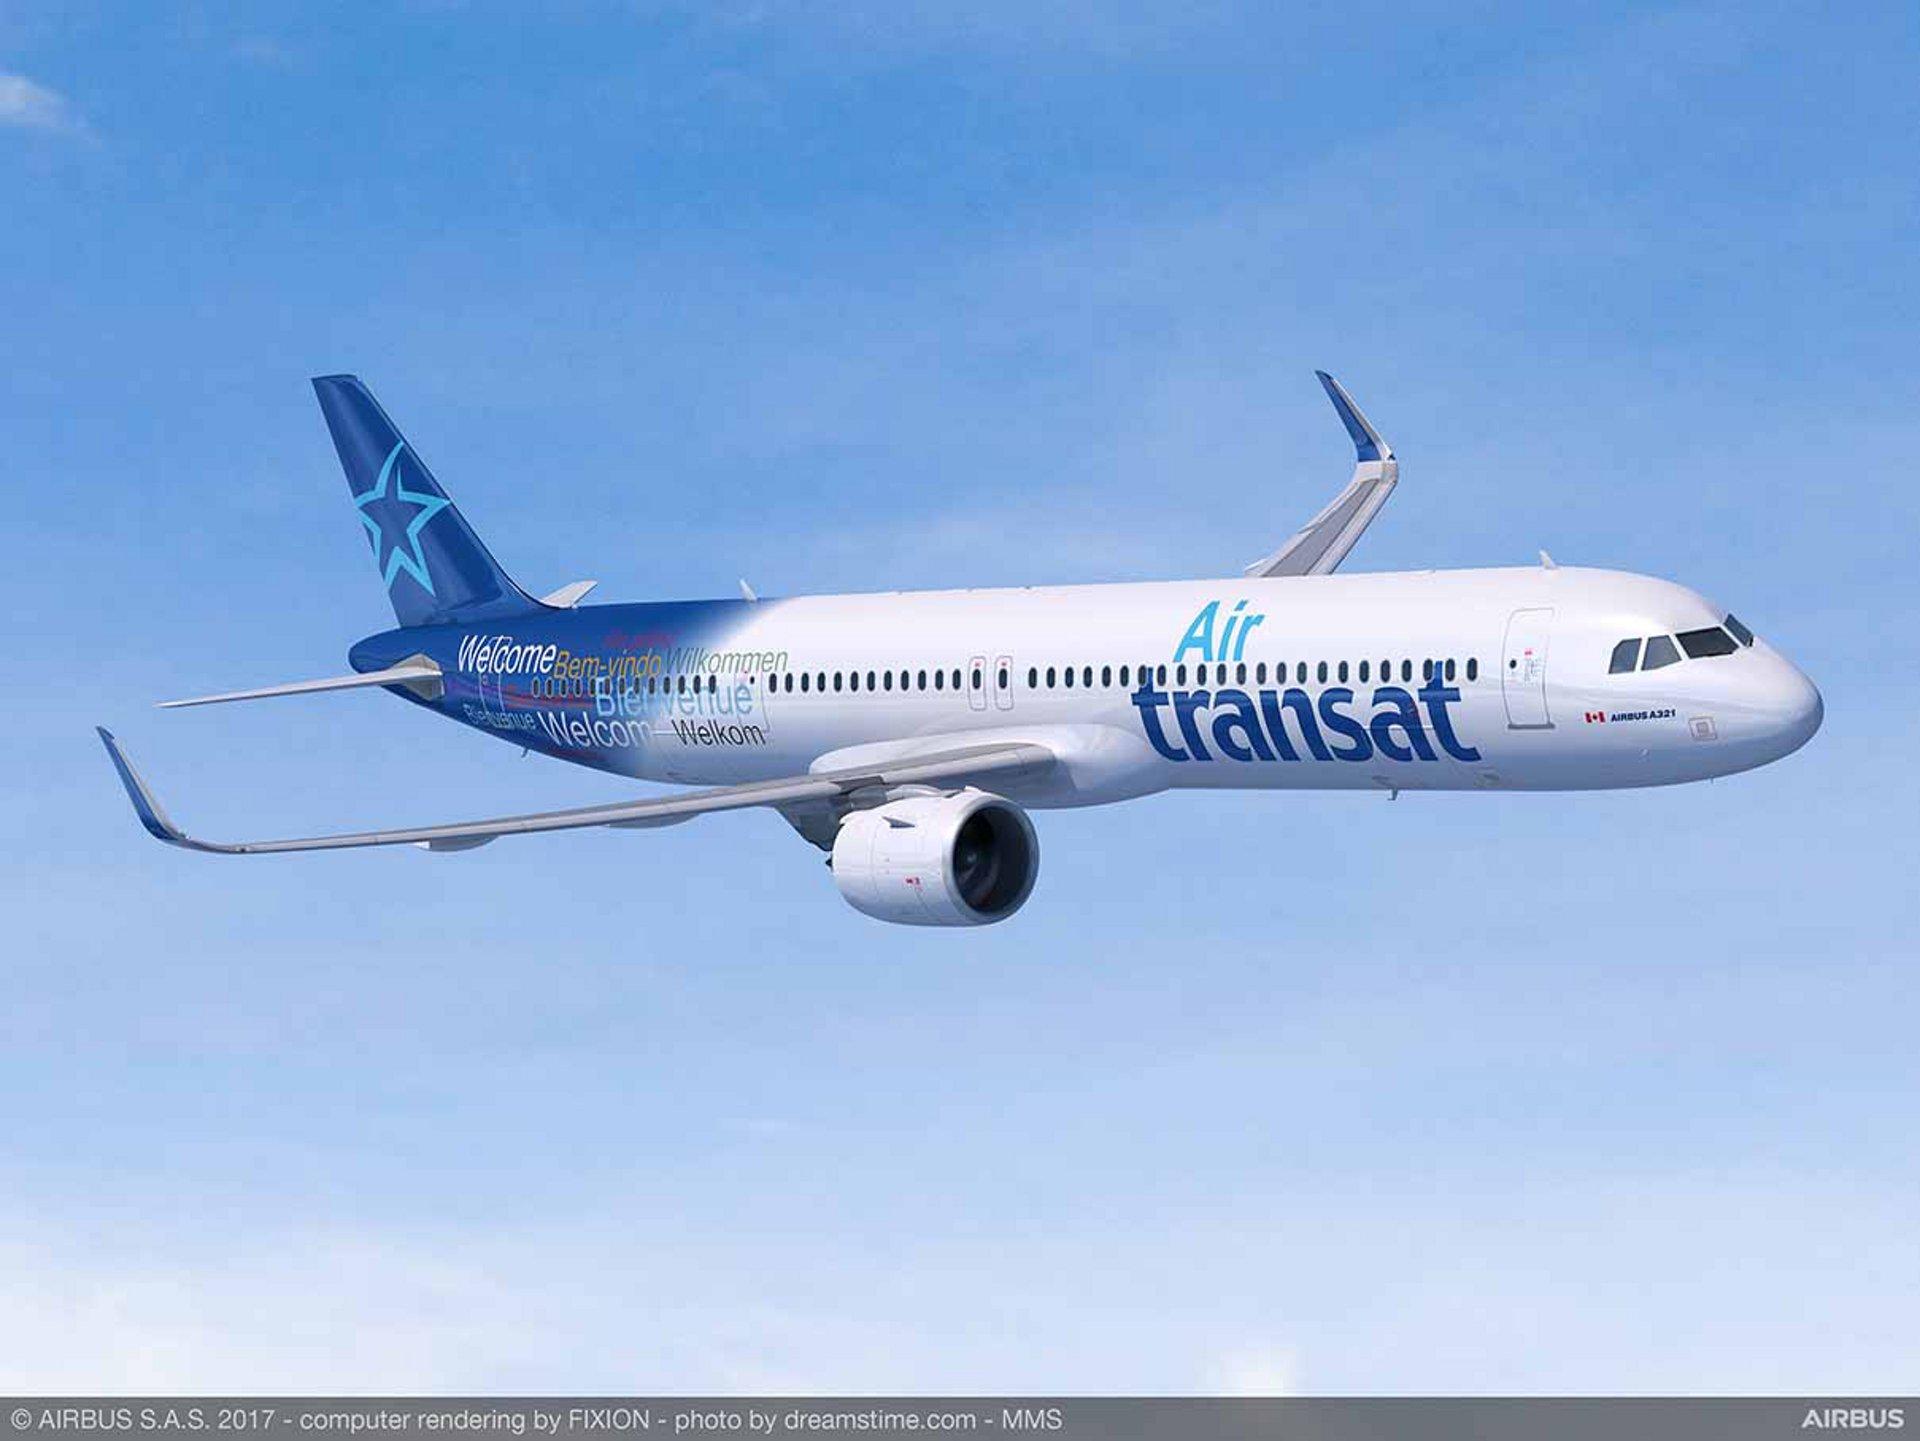 Air Transat Wird Erster A321lr Betreiber In Nordamerika